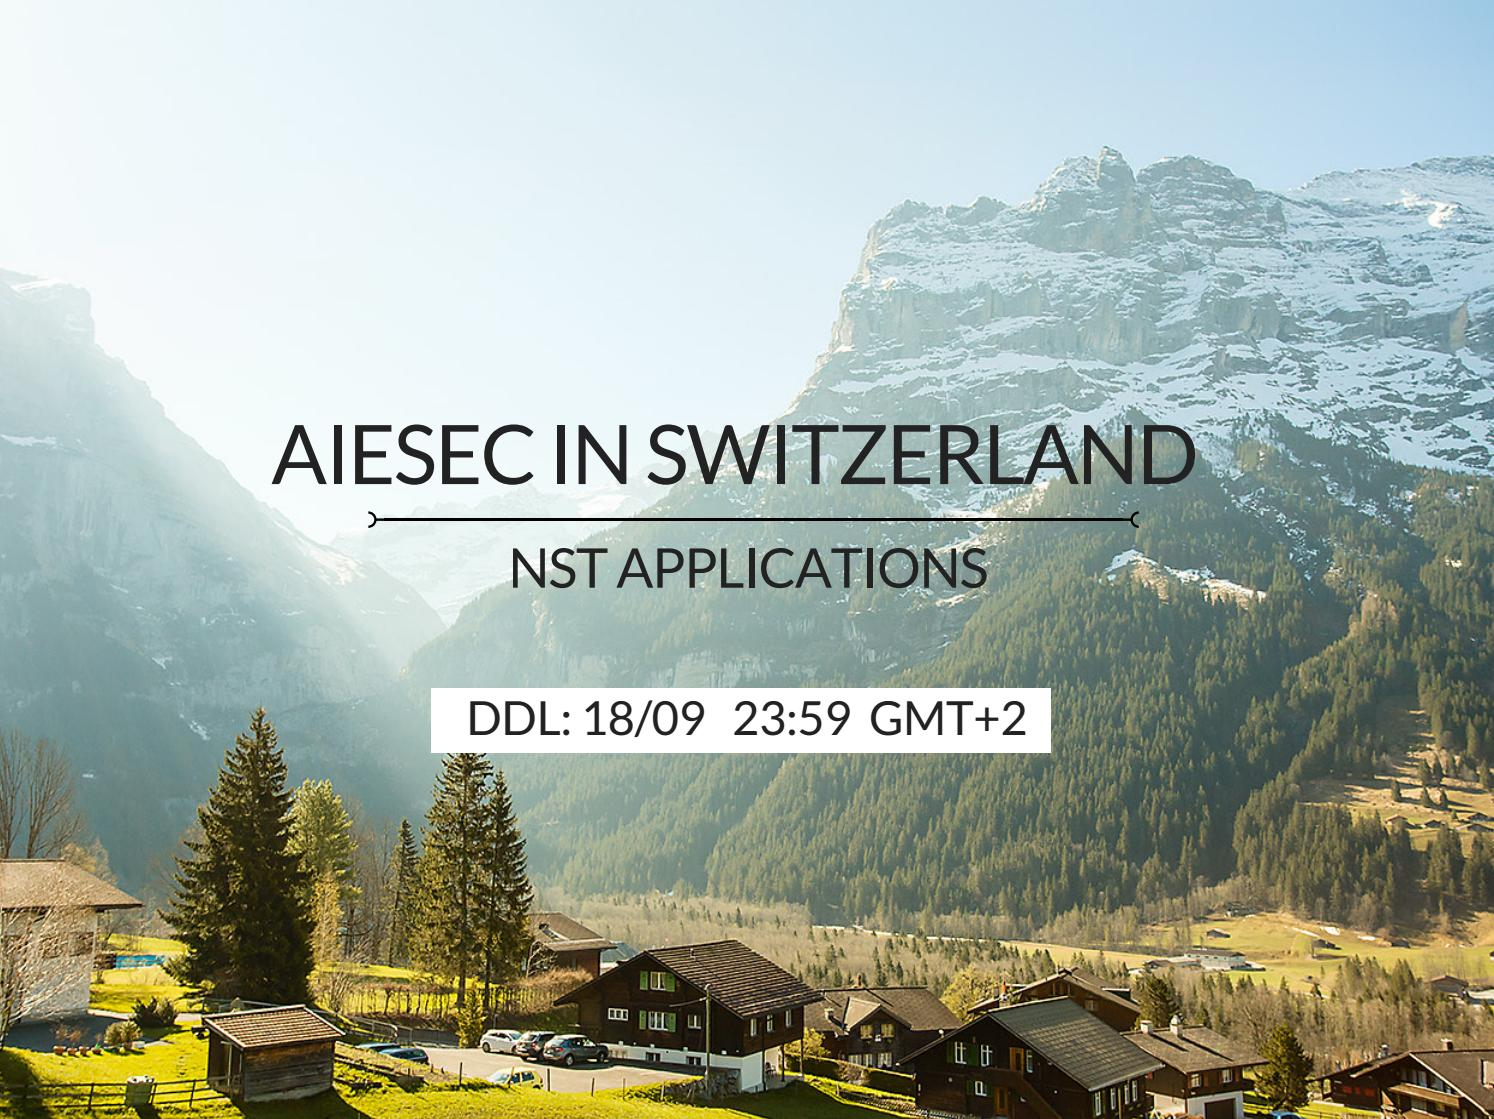 aiesec application